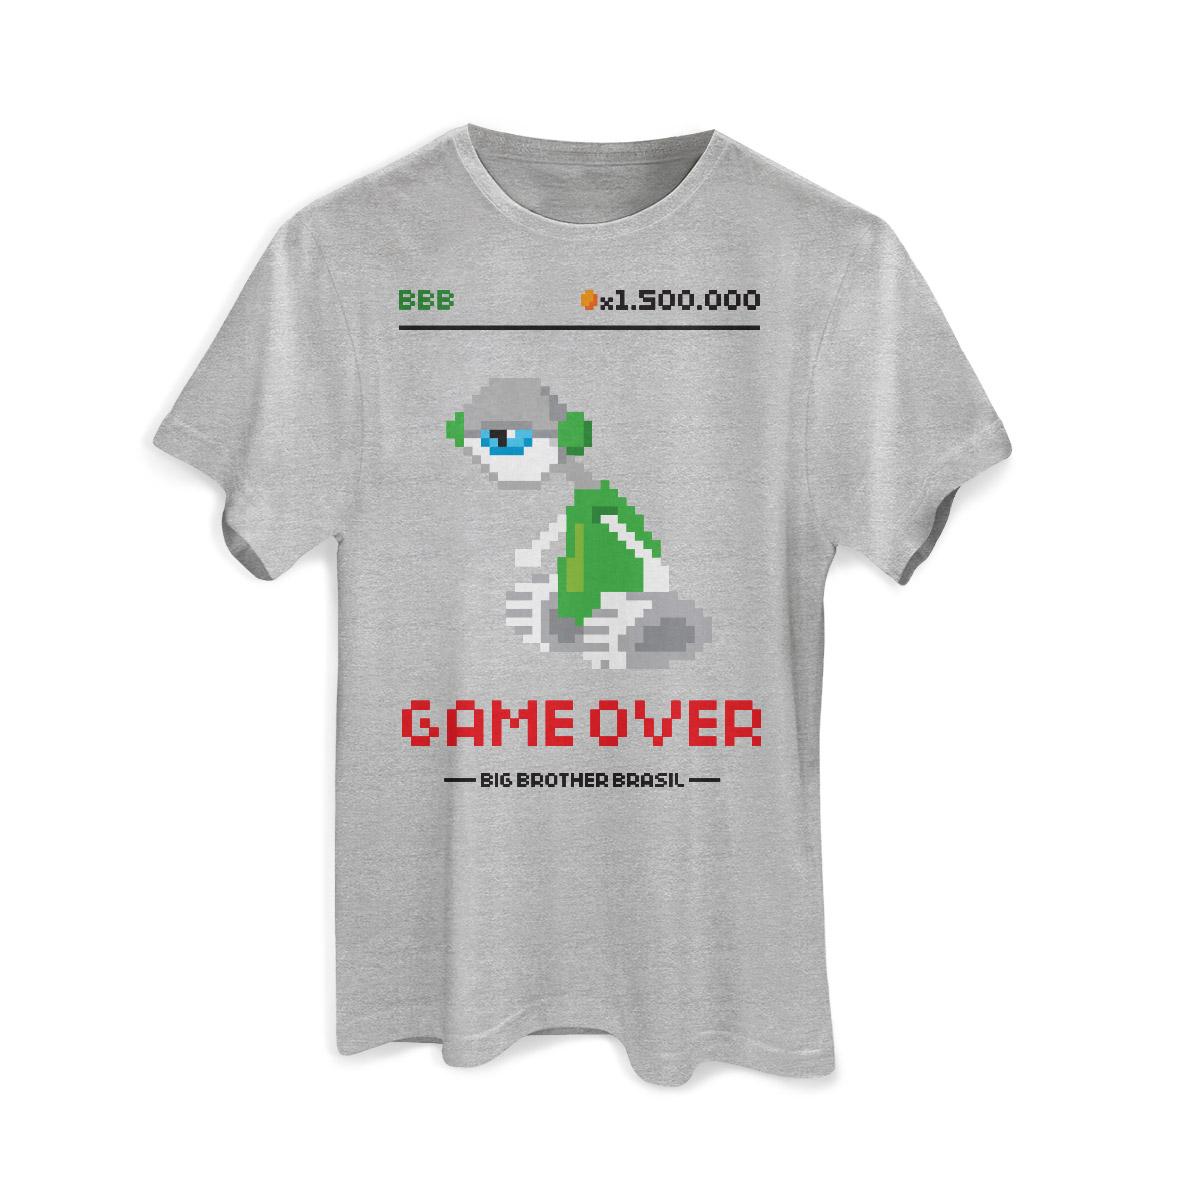 Camiseta Masculina Big Brother Brasil Game Over Modelo 2